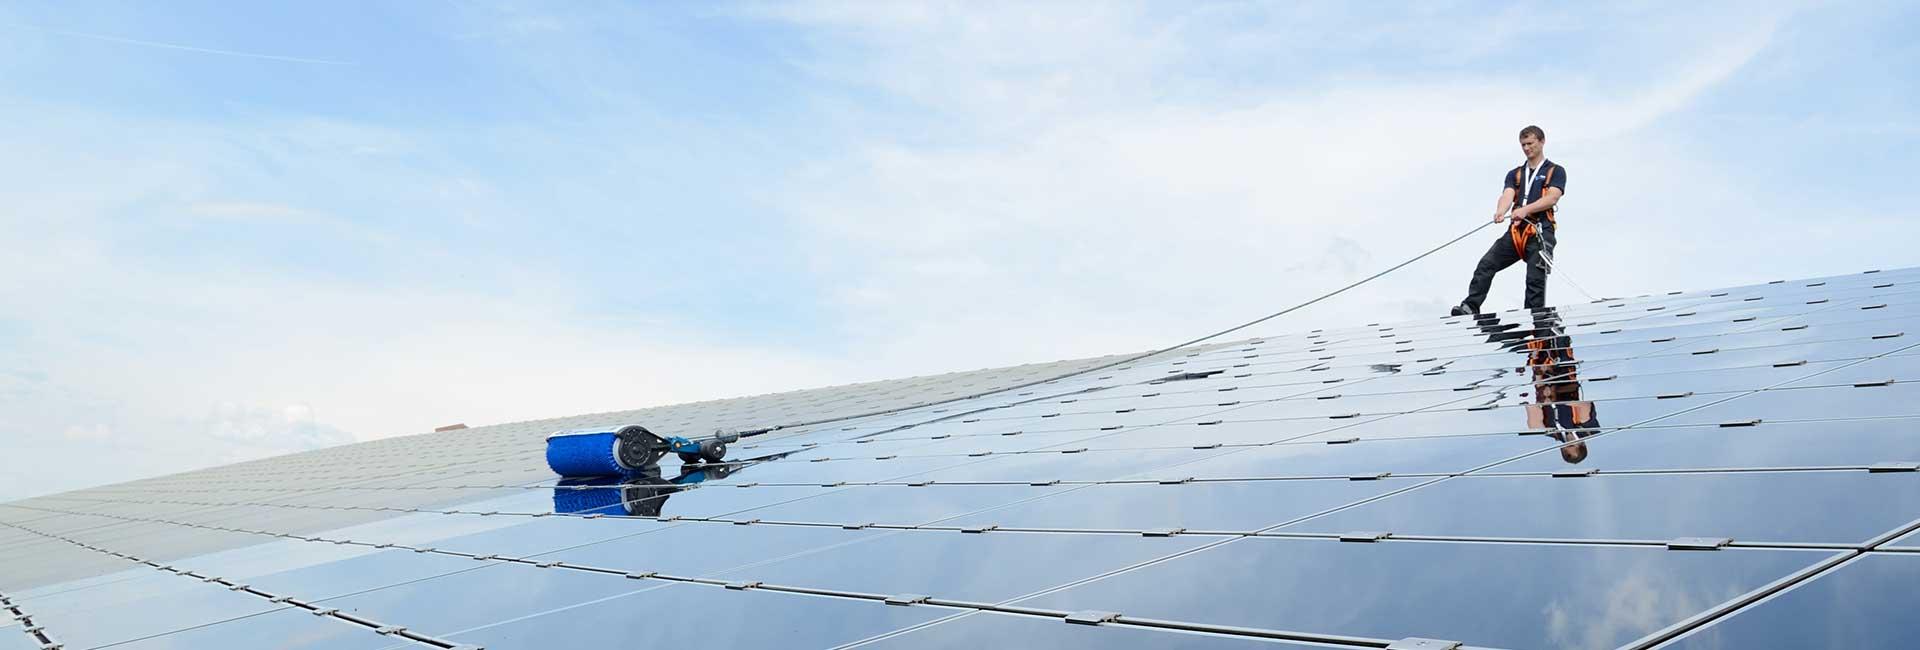 Reinigung vom Dach mit dem SOLA-TECS W